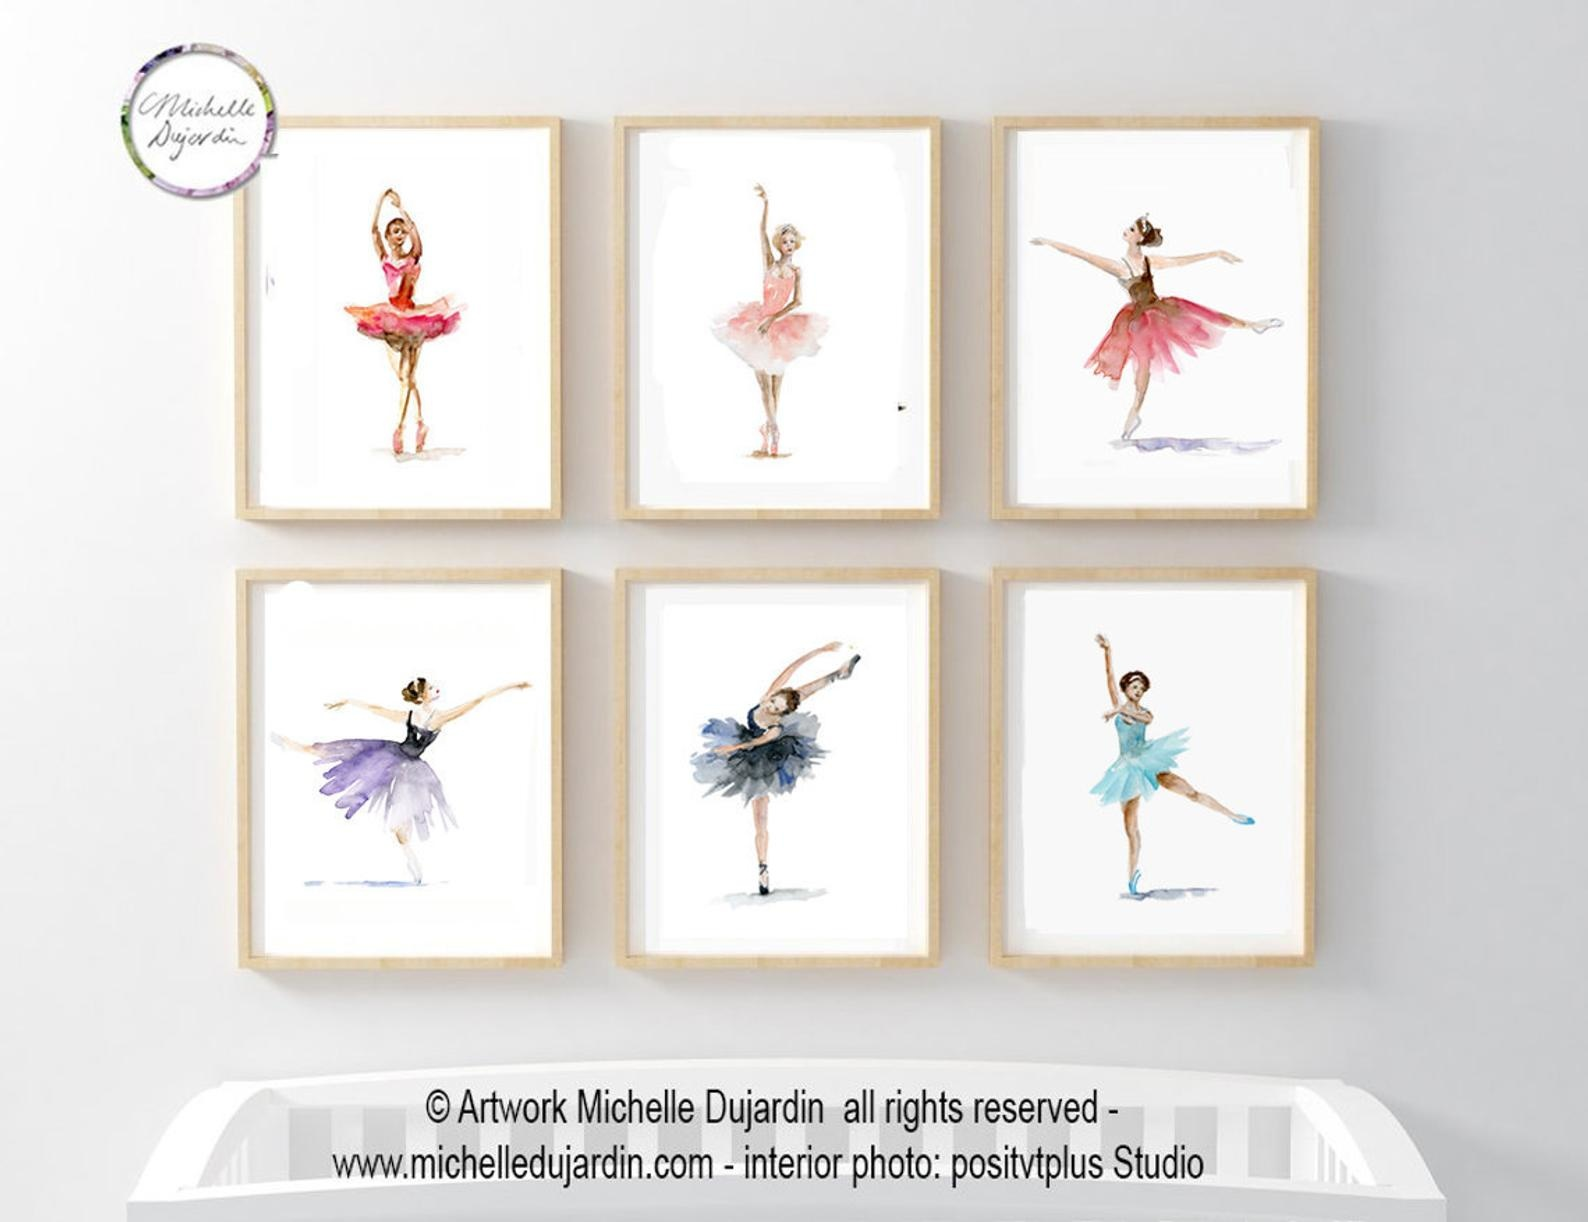 6 prints of ballet dancers